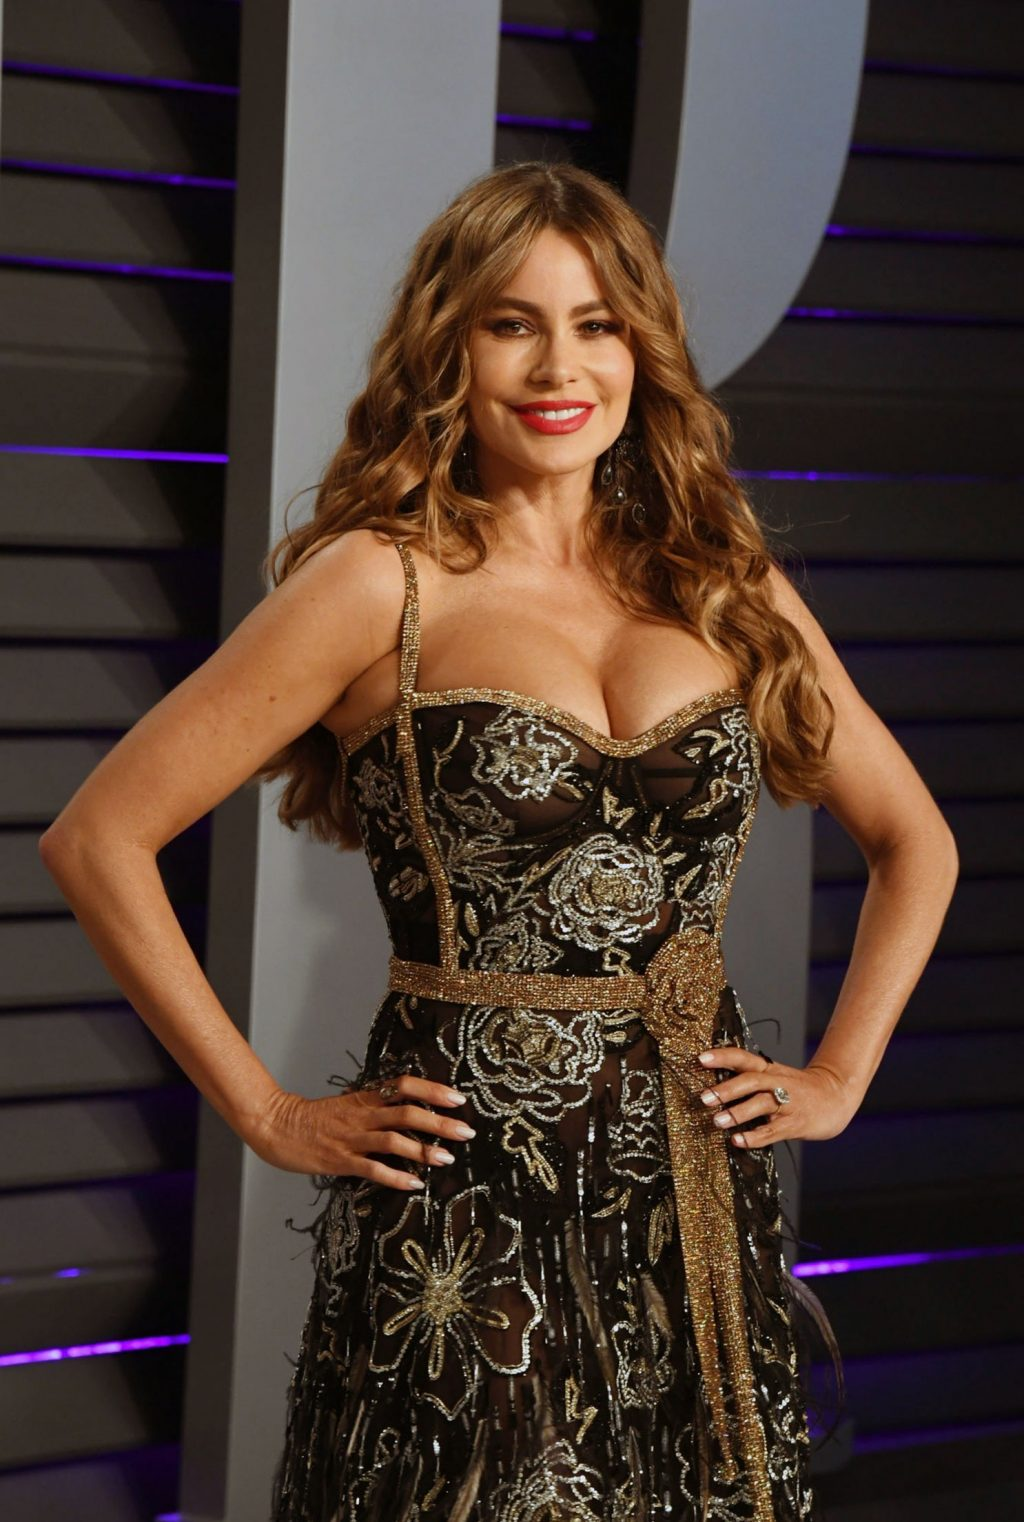 Sofia Vergara cleavage